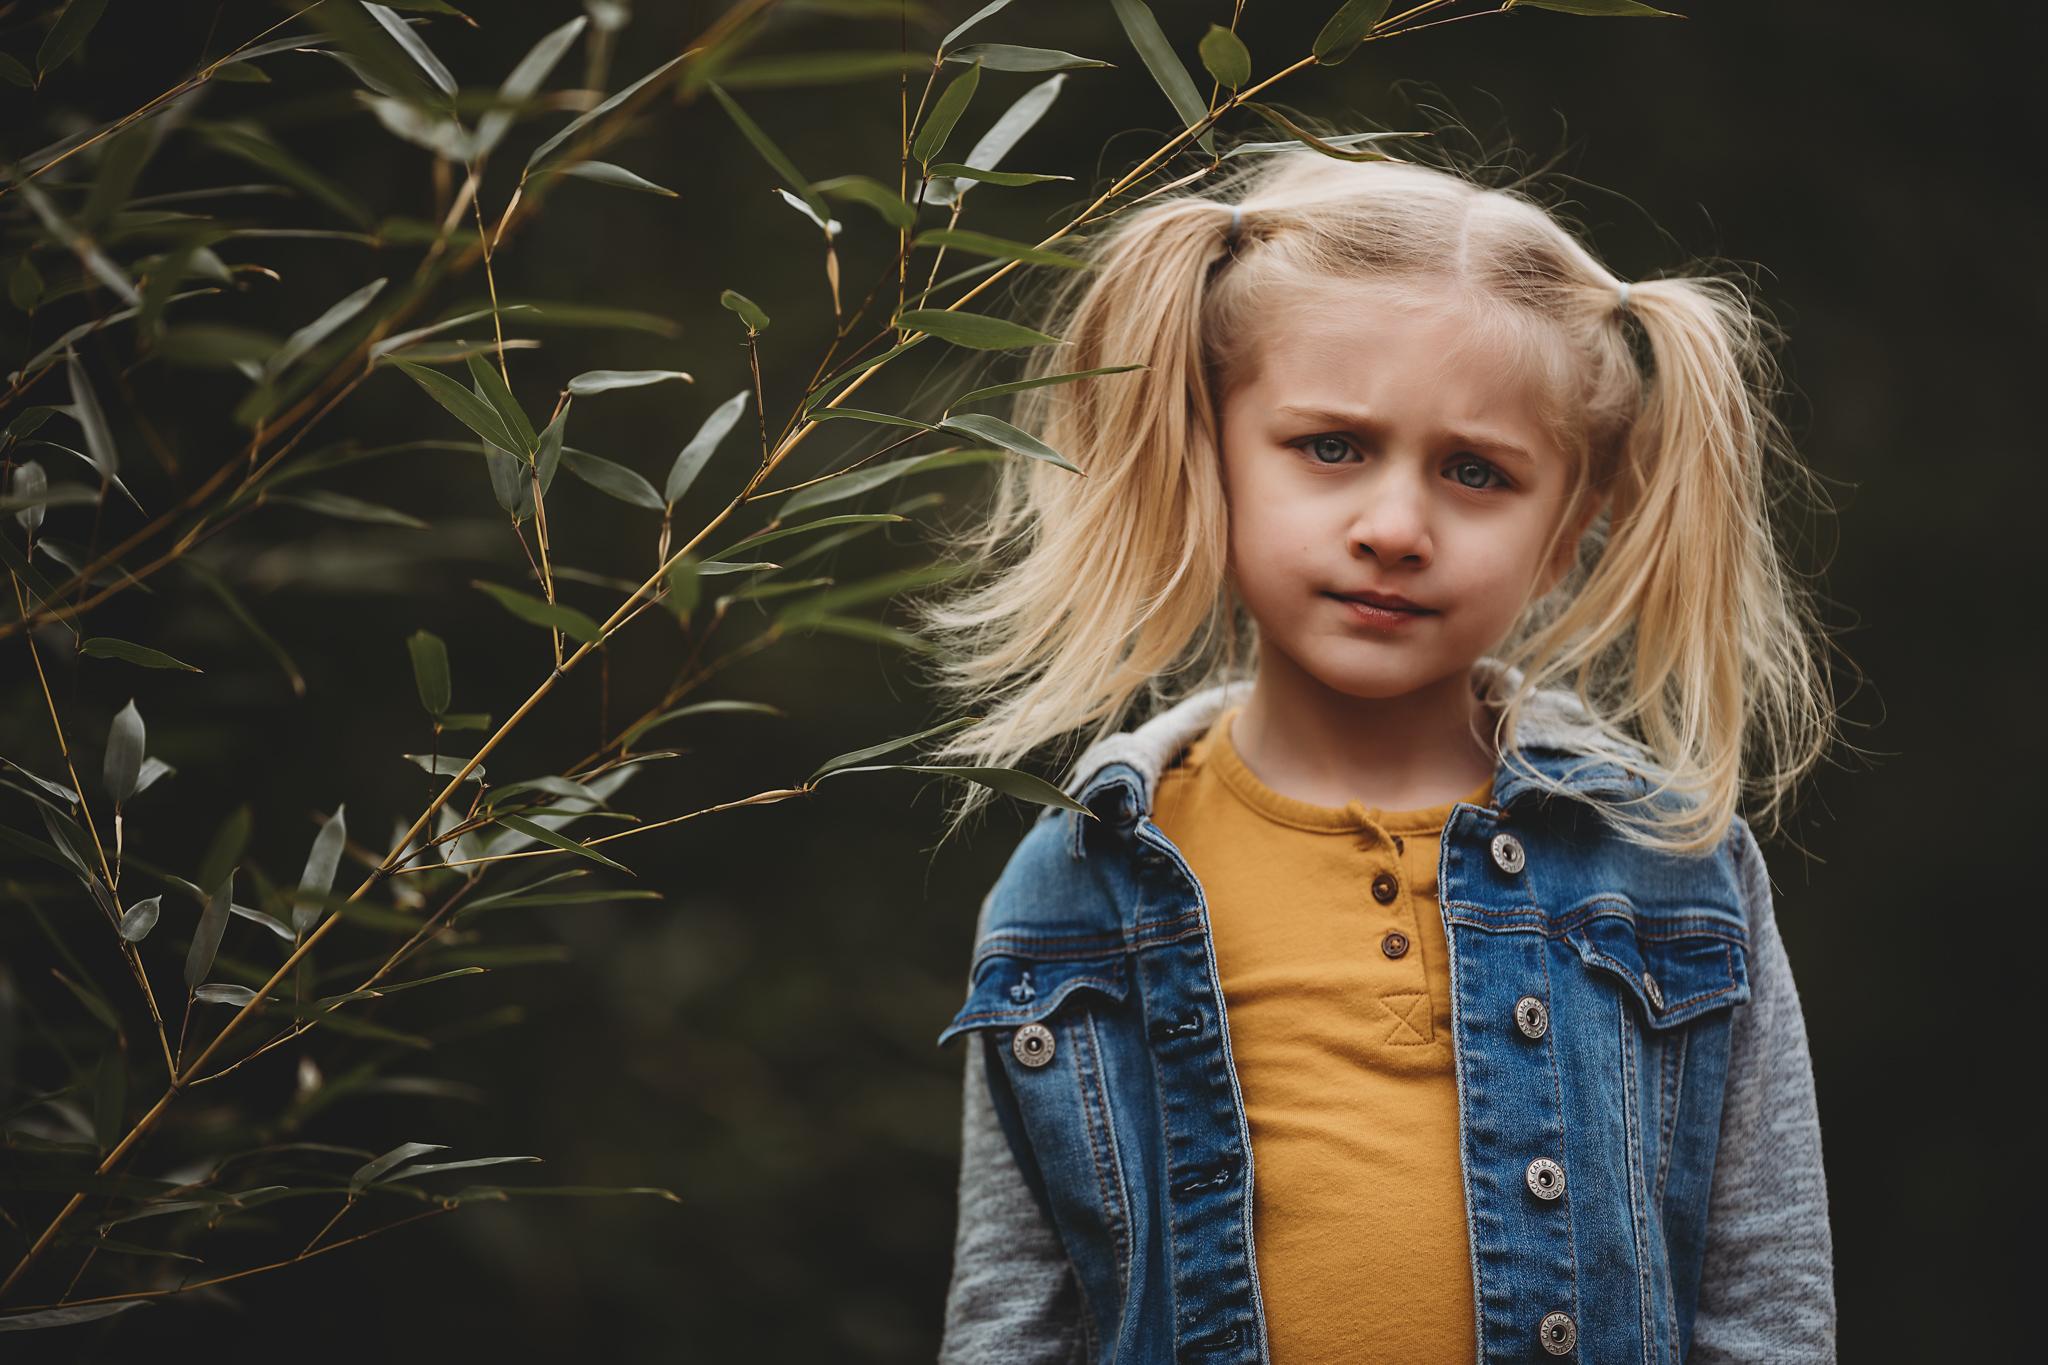 Long-island-photographer-hello-olivia-photography-children-kids-photos-new-york-lifestyle-portraits-suffolk-County-LI-53.jpg